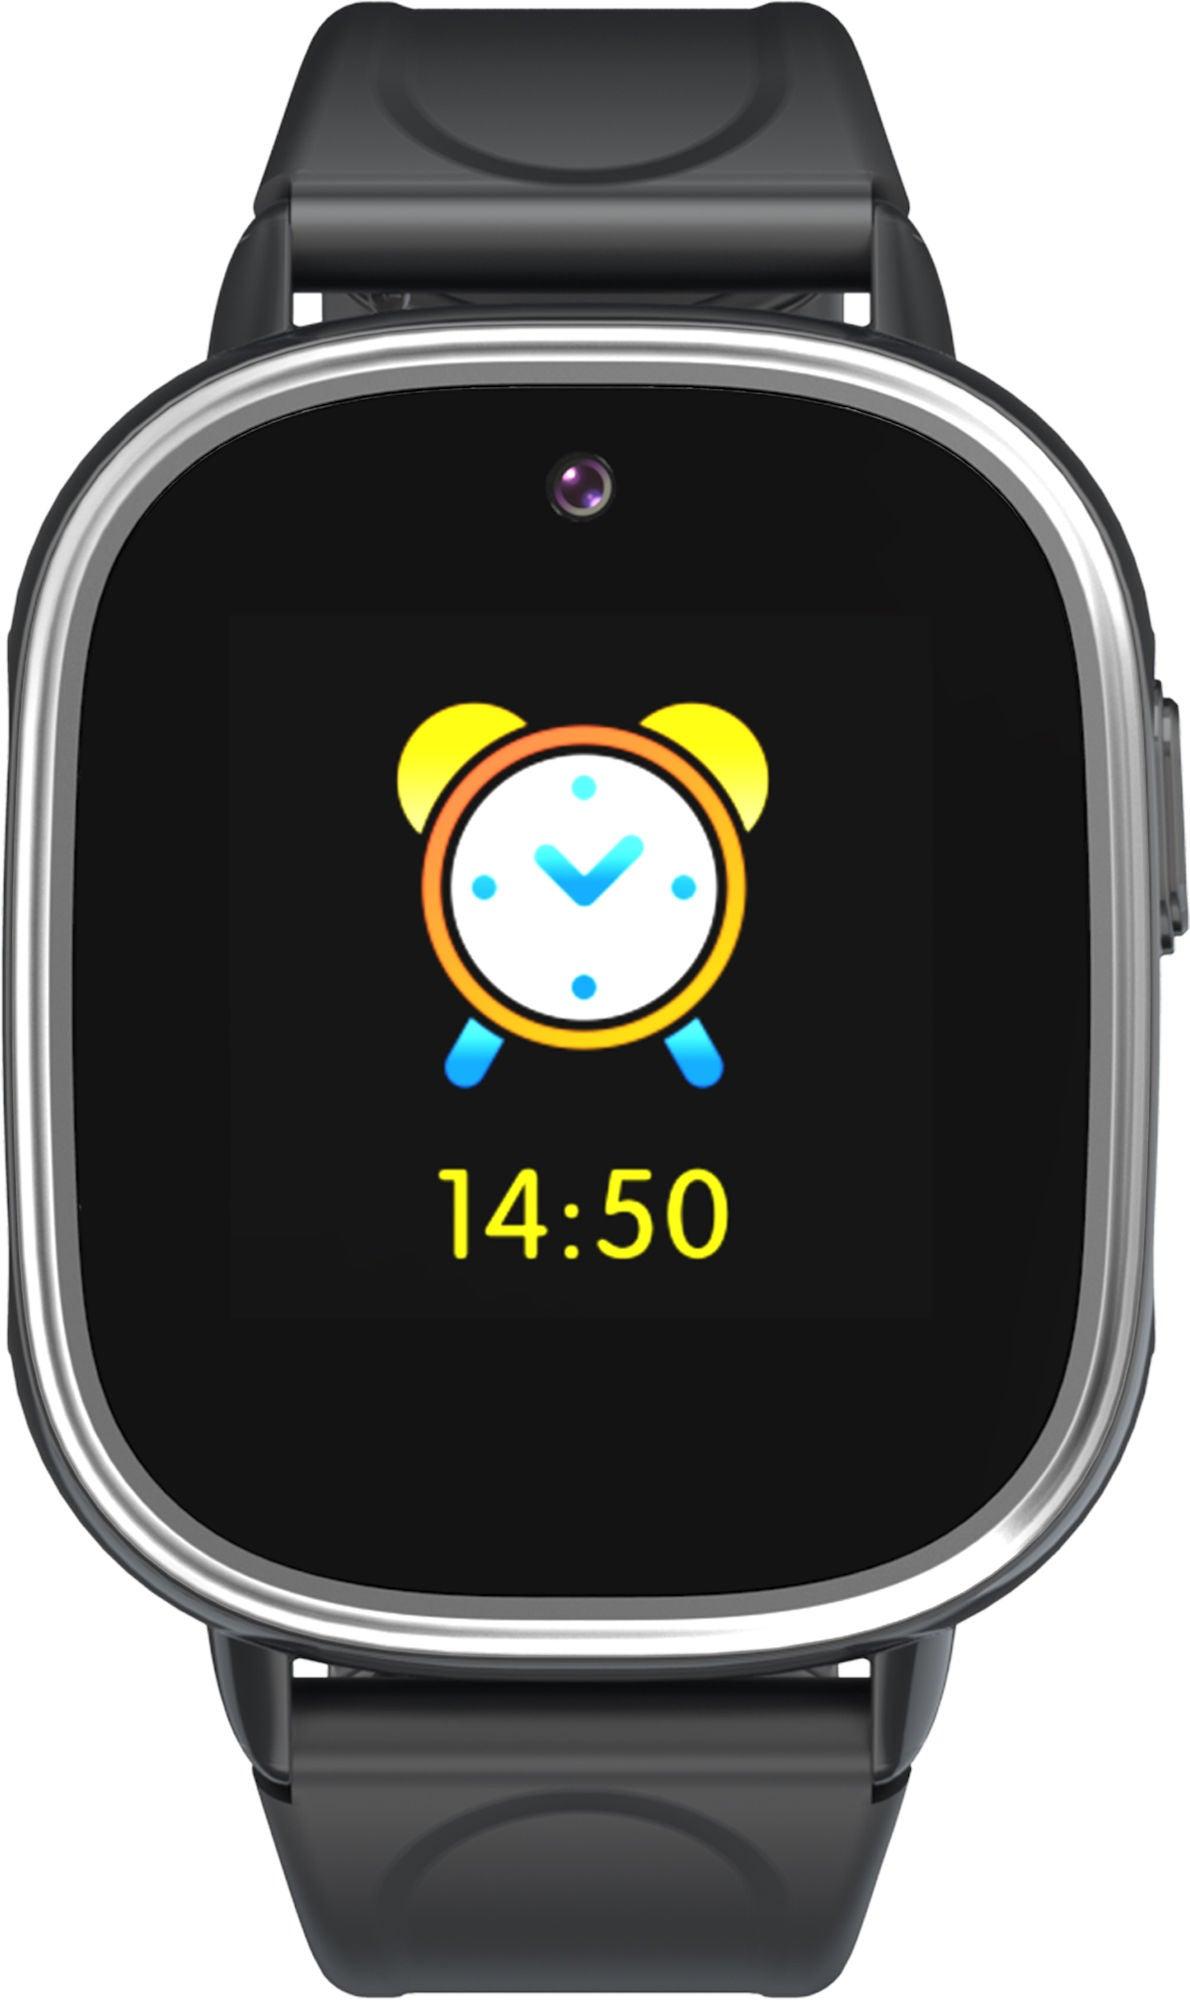 Cmee 2C GPS-klocka, Svart